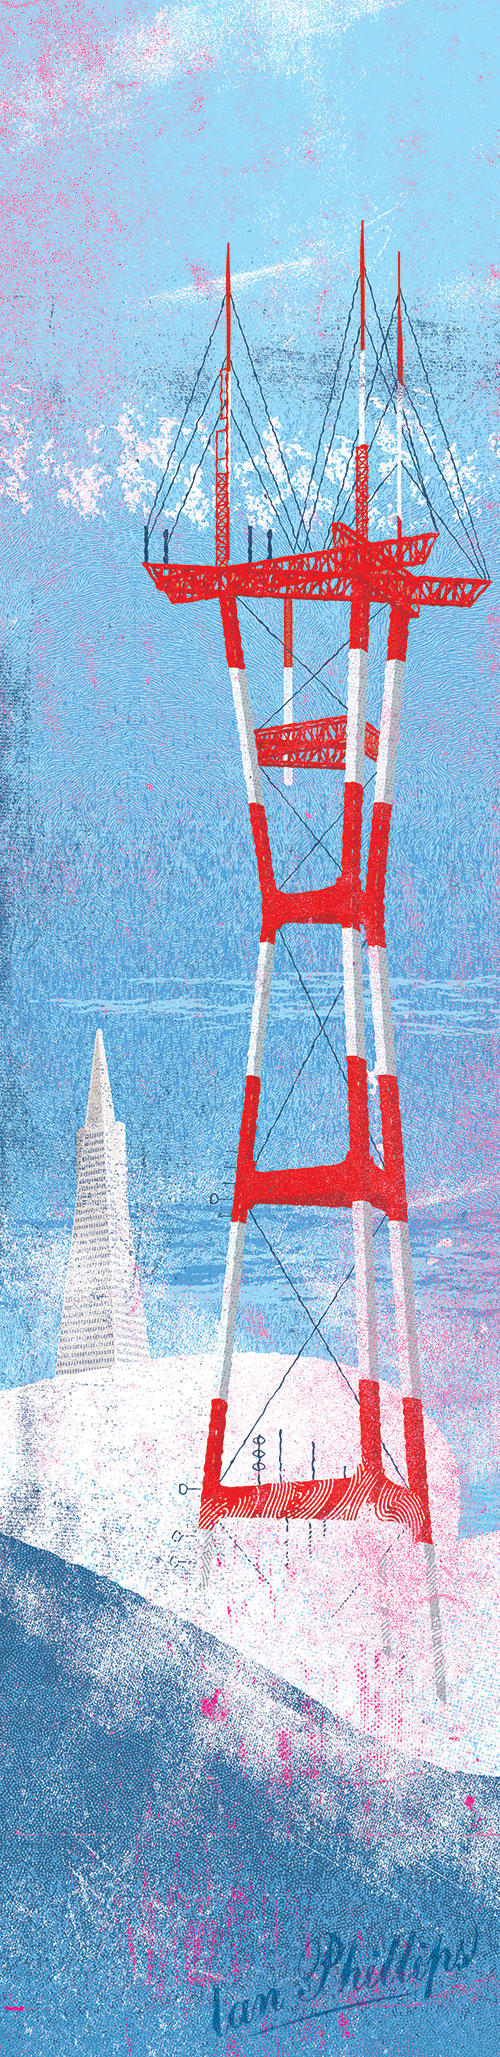 San Francisco • Sutro Tower • Transamerica Pyramid • Copyright © Ian Phillips